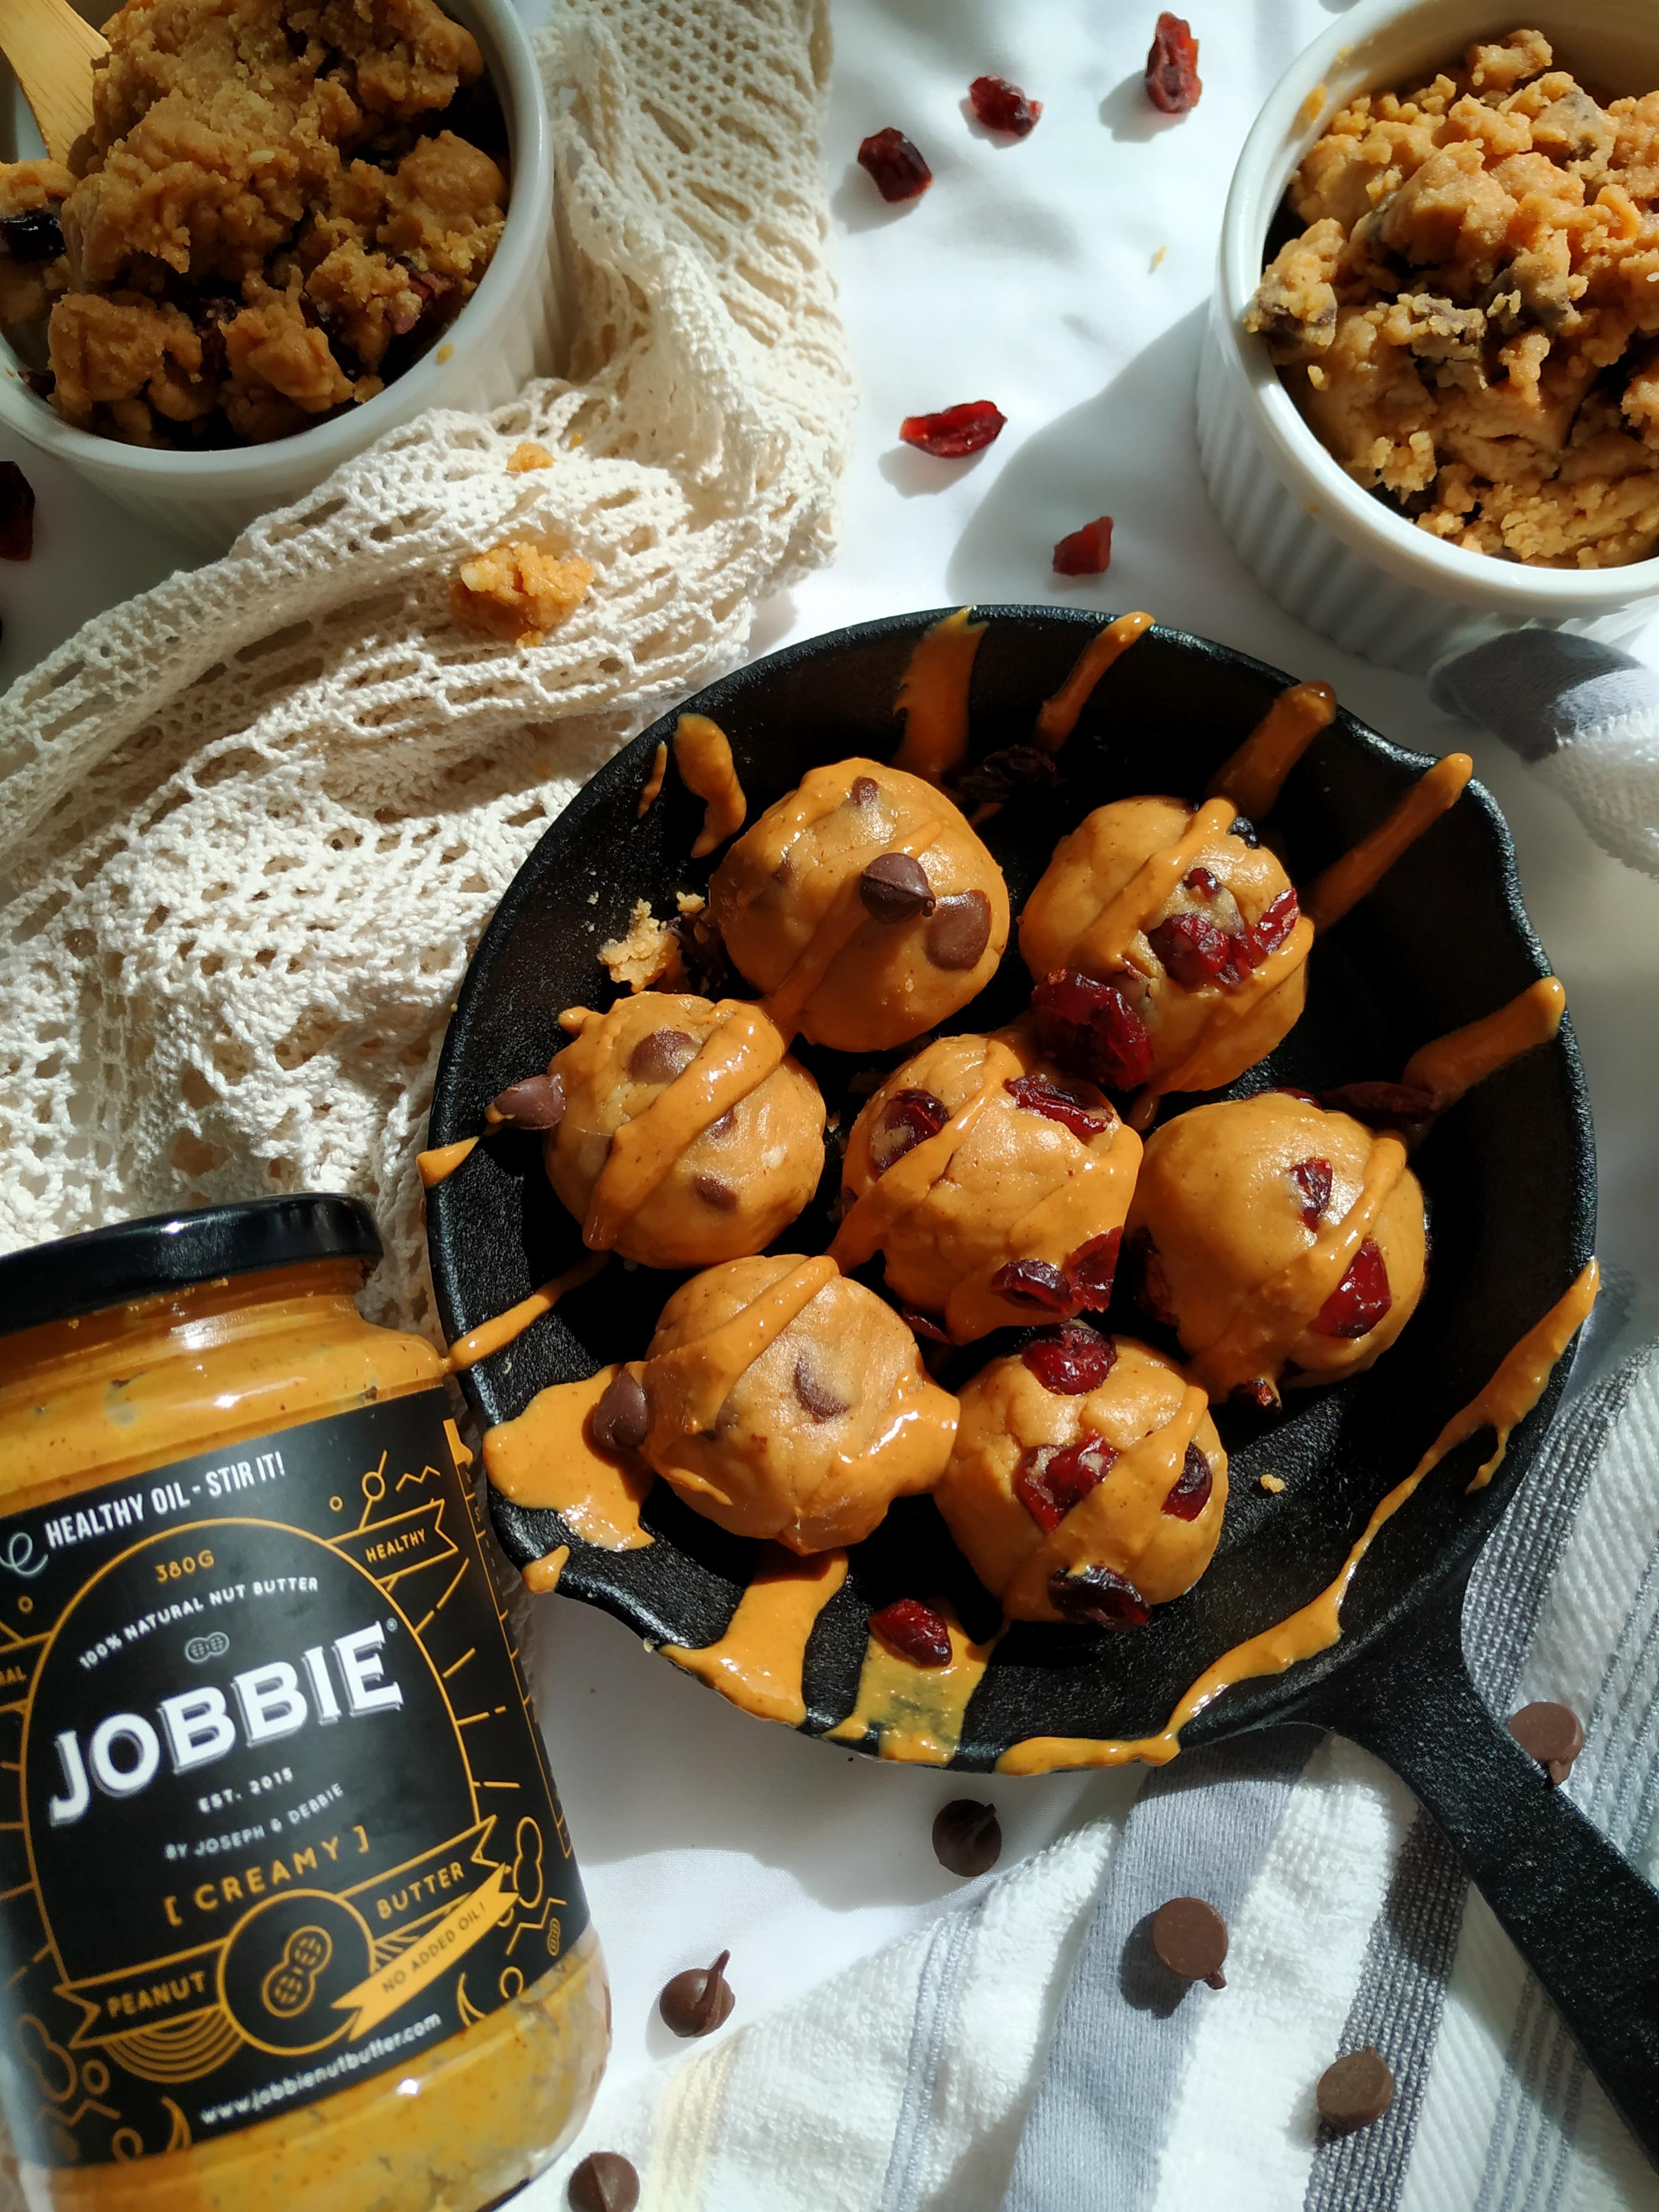 Edible Raw JOBBIE Peanut Butter Cookie Dough